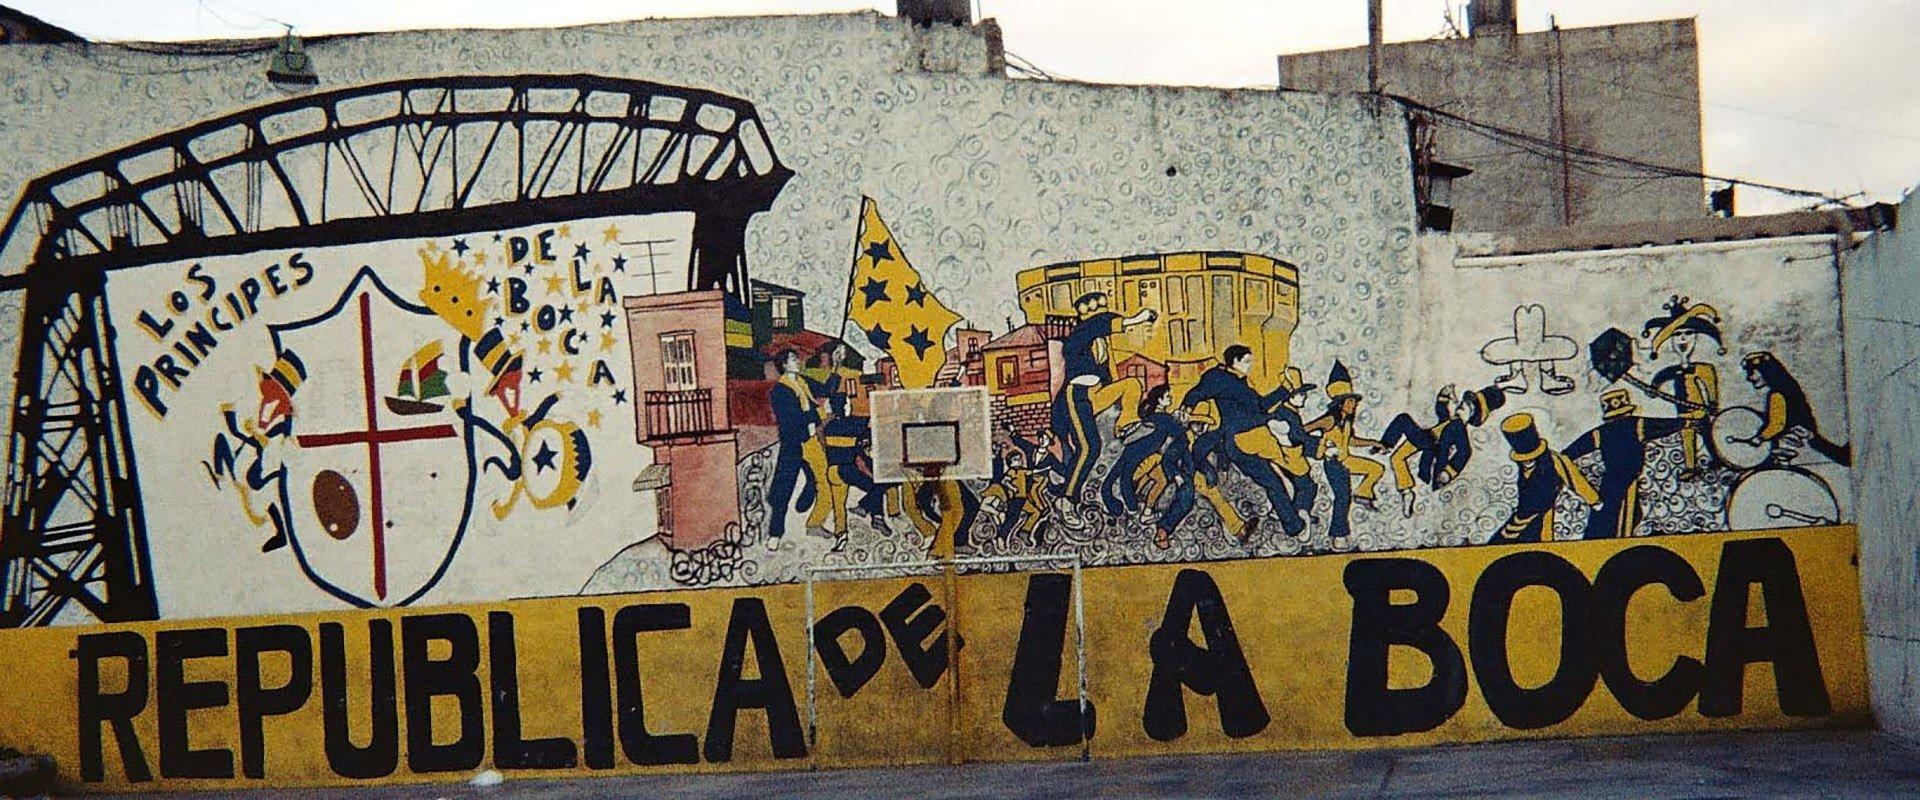 argentine buenos aires peinture graffiti art de rue republica de la boca terrains basket panier urbain